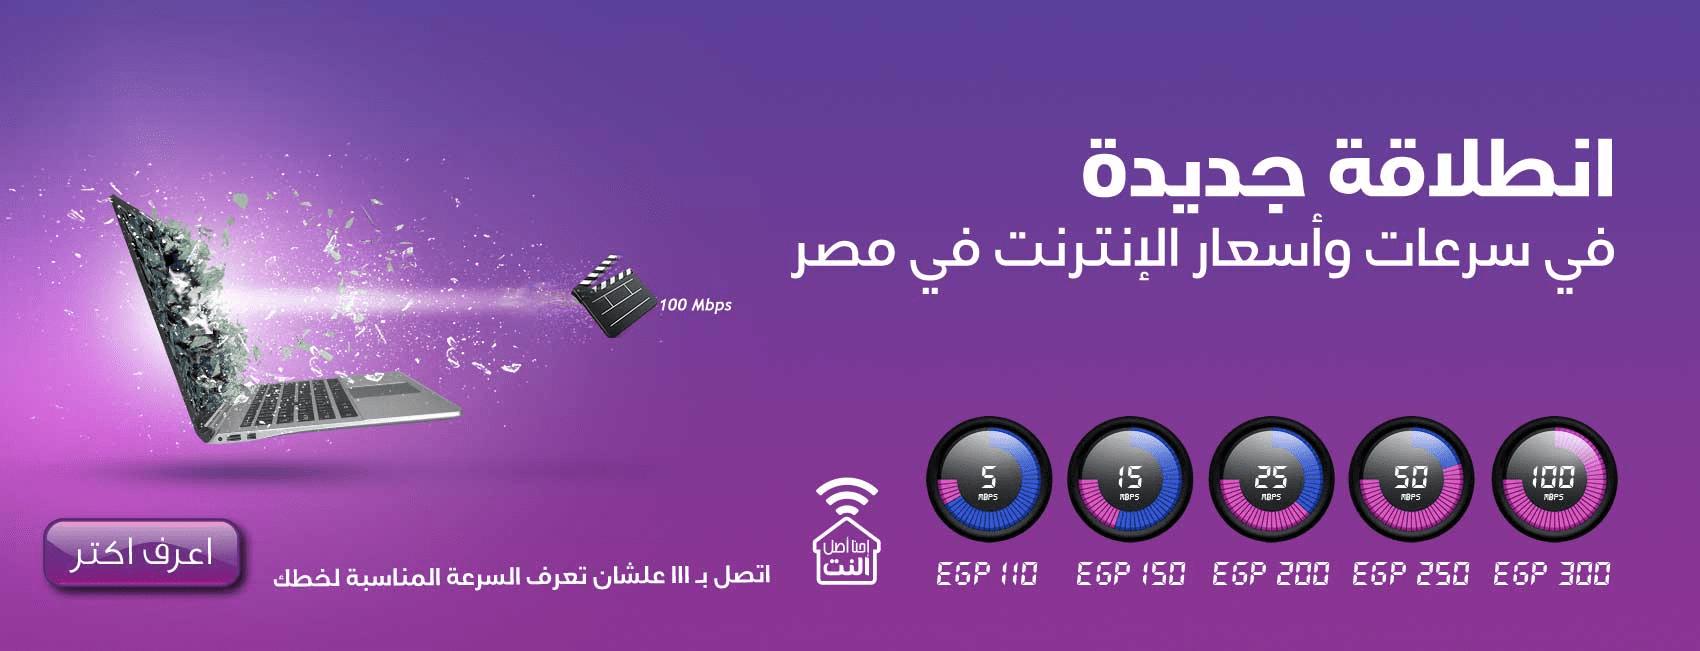 ff4015582 باقات الانترنت من WE